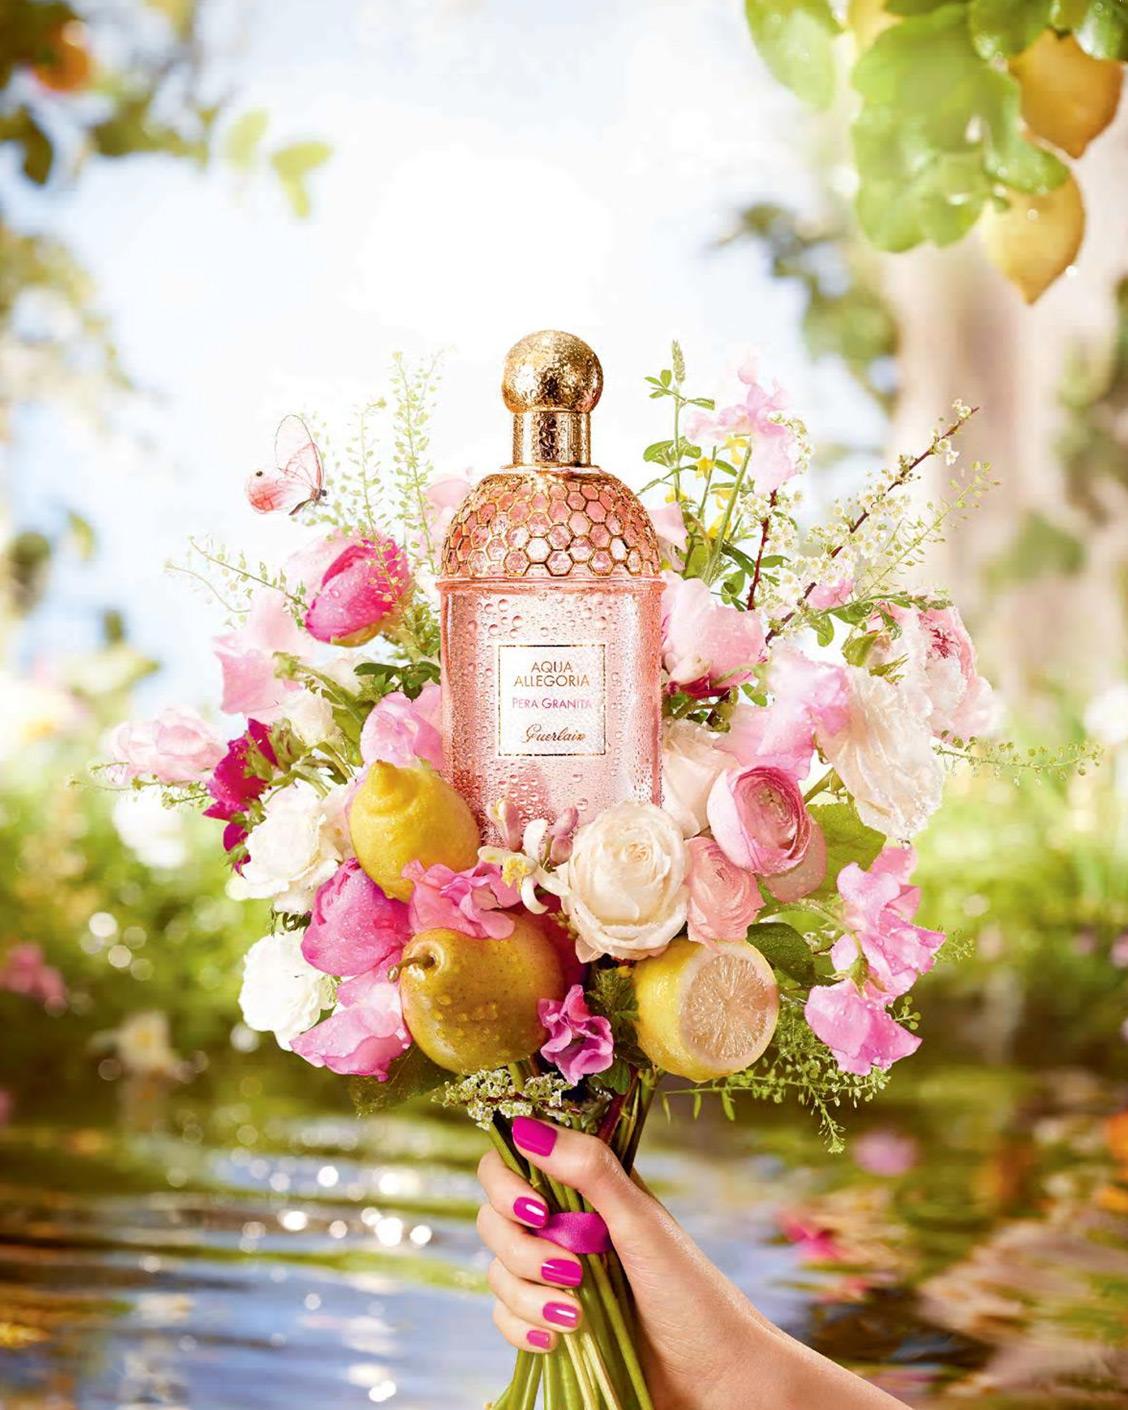 image Le parfum the perfume